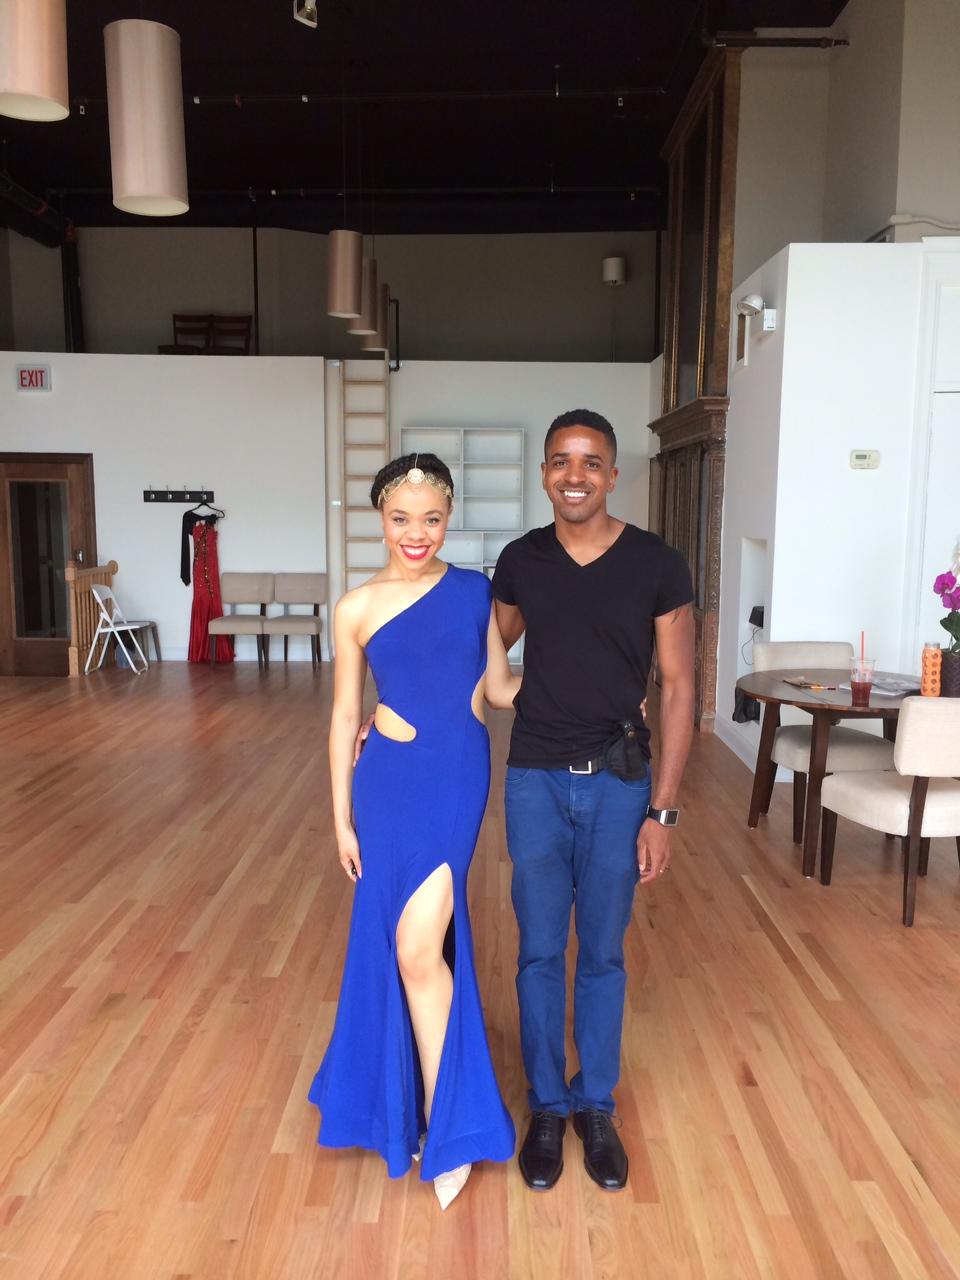 Angela and Matt preparing for their wedding while taking ballroom dance lessons